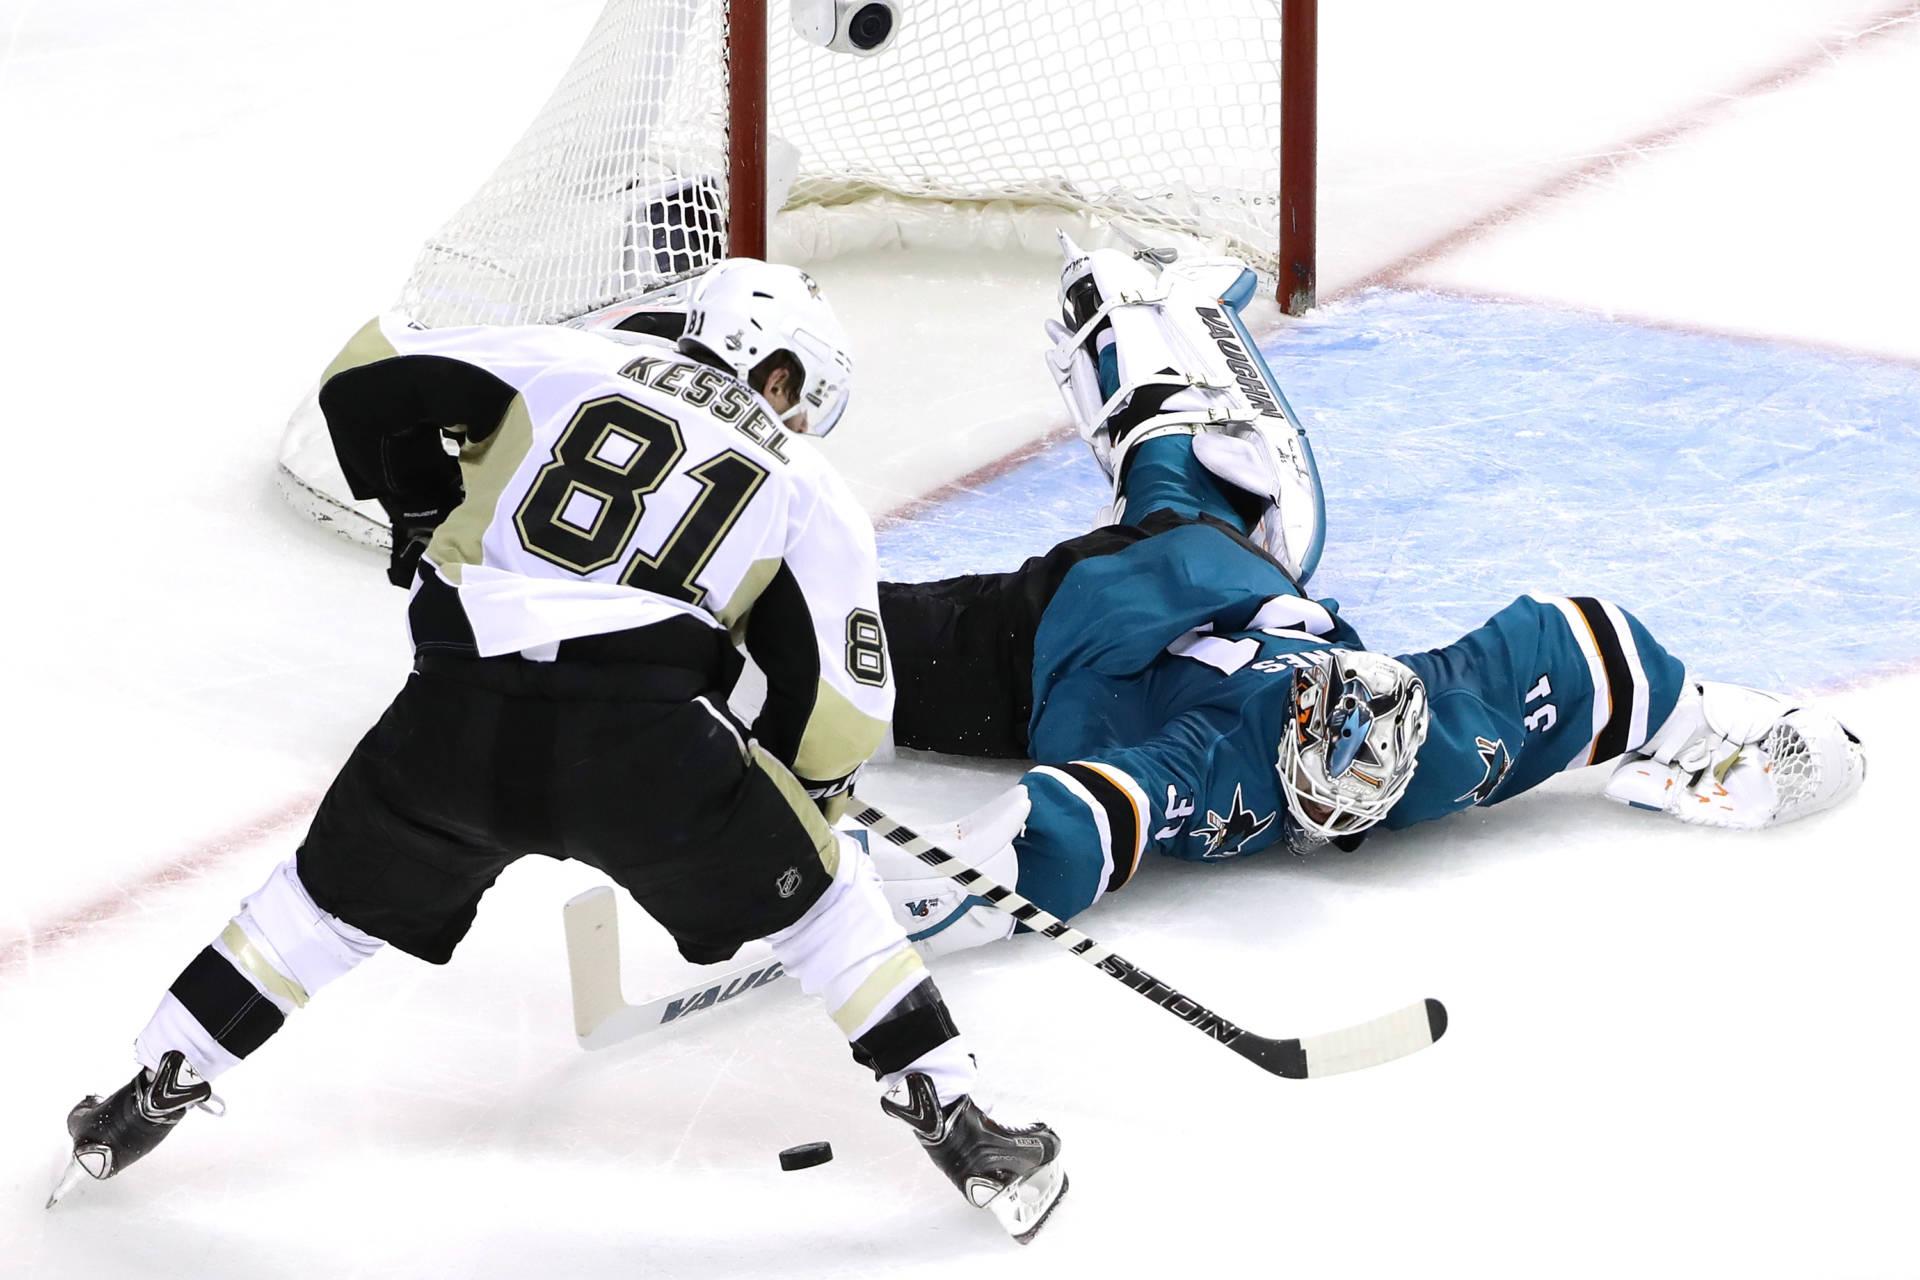 Stanley Cup Final: Penguins Win Cup Despite Goalie's Heroics